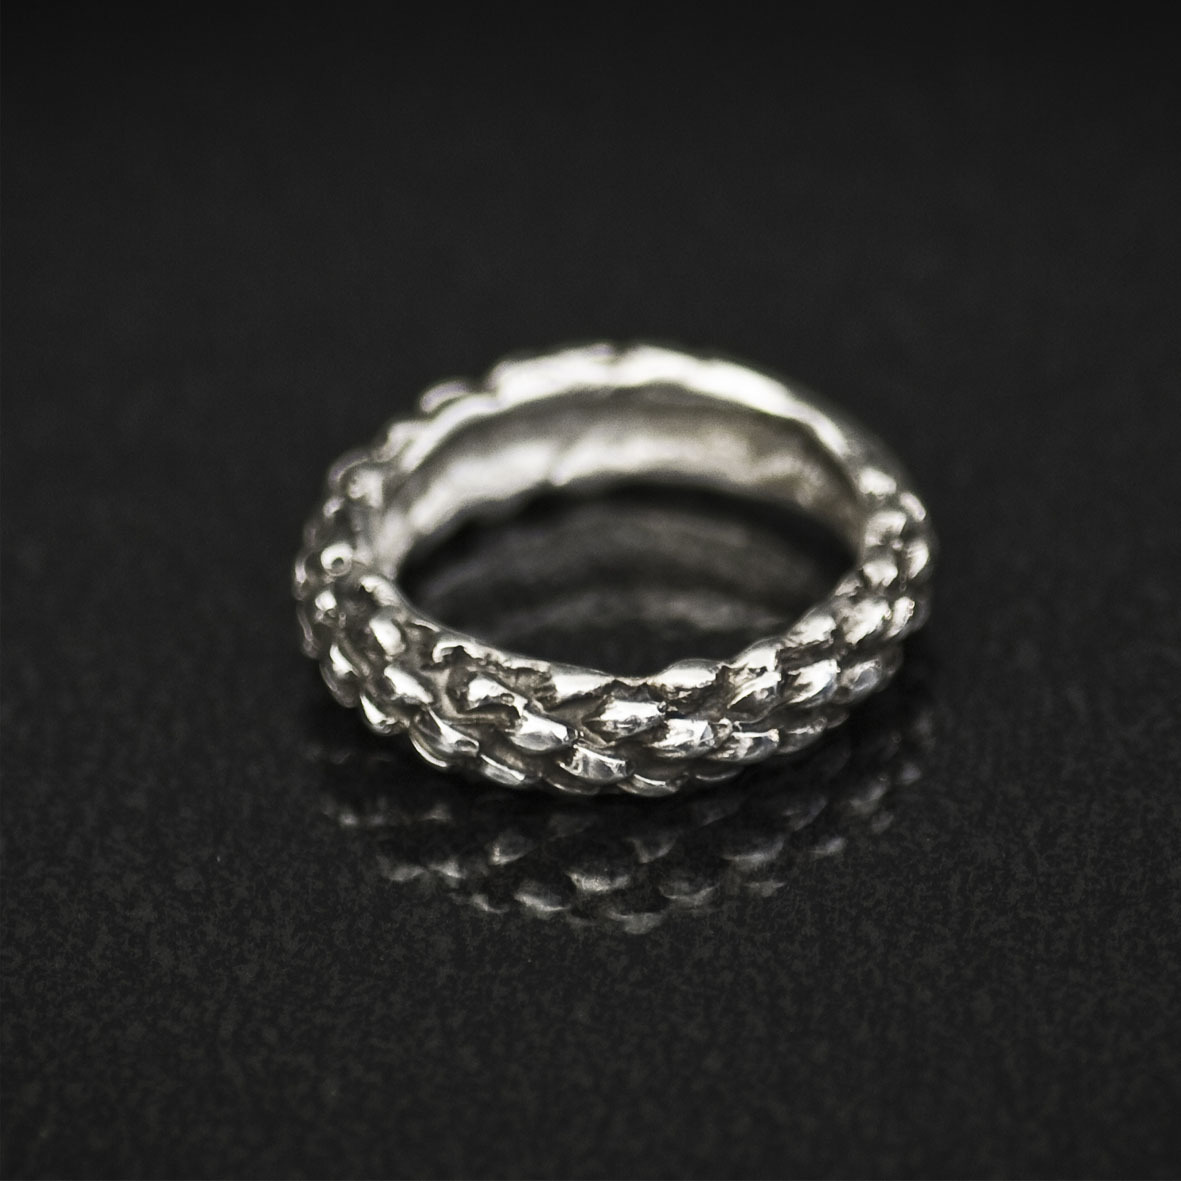 Pine Needle Ring